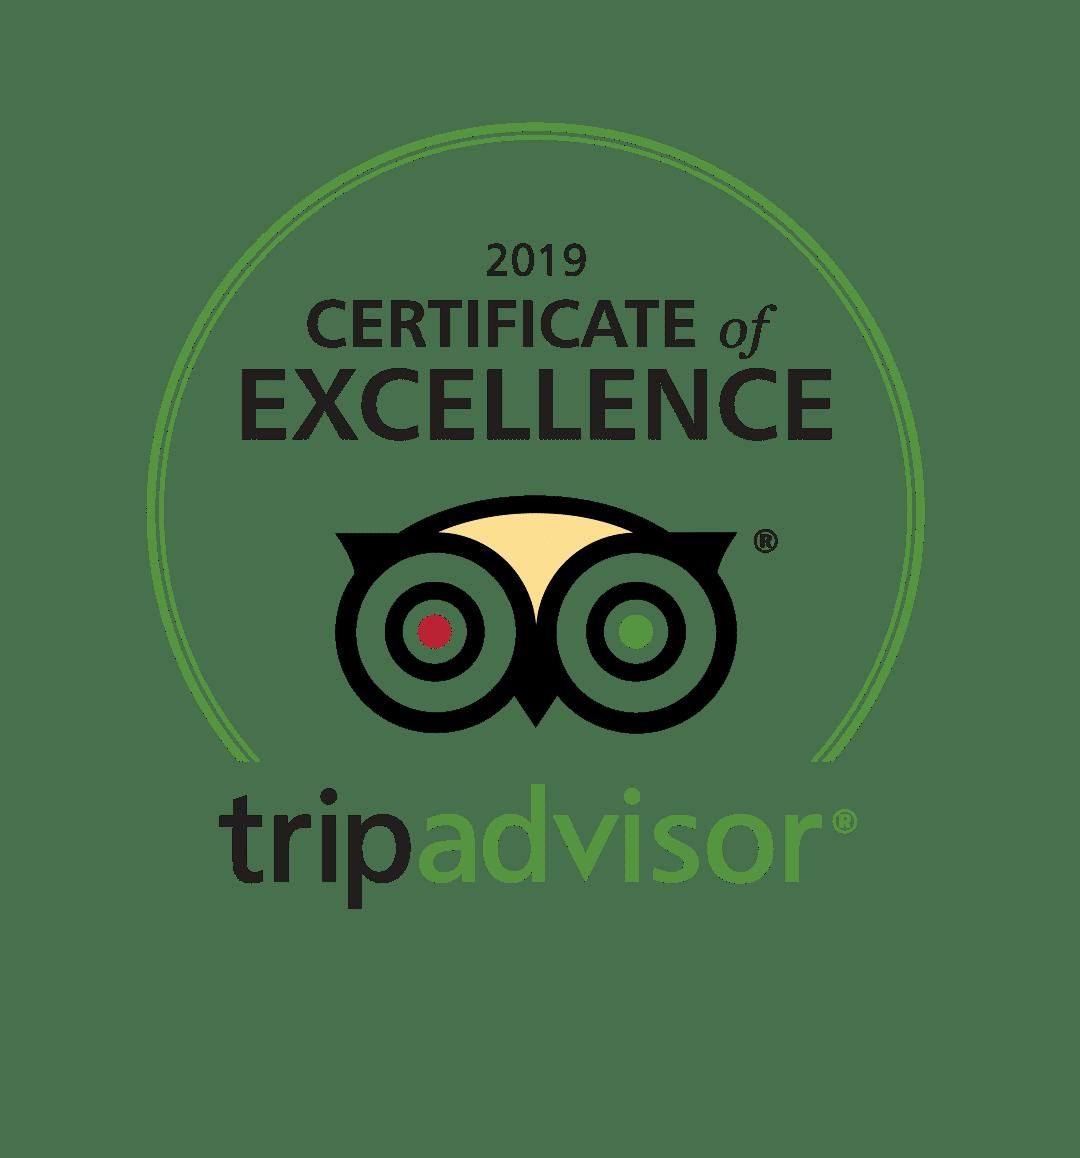 TripAdvisor: 2019 Certificate of Excellence